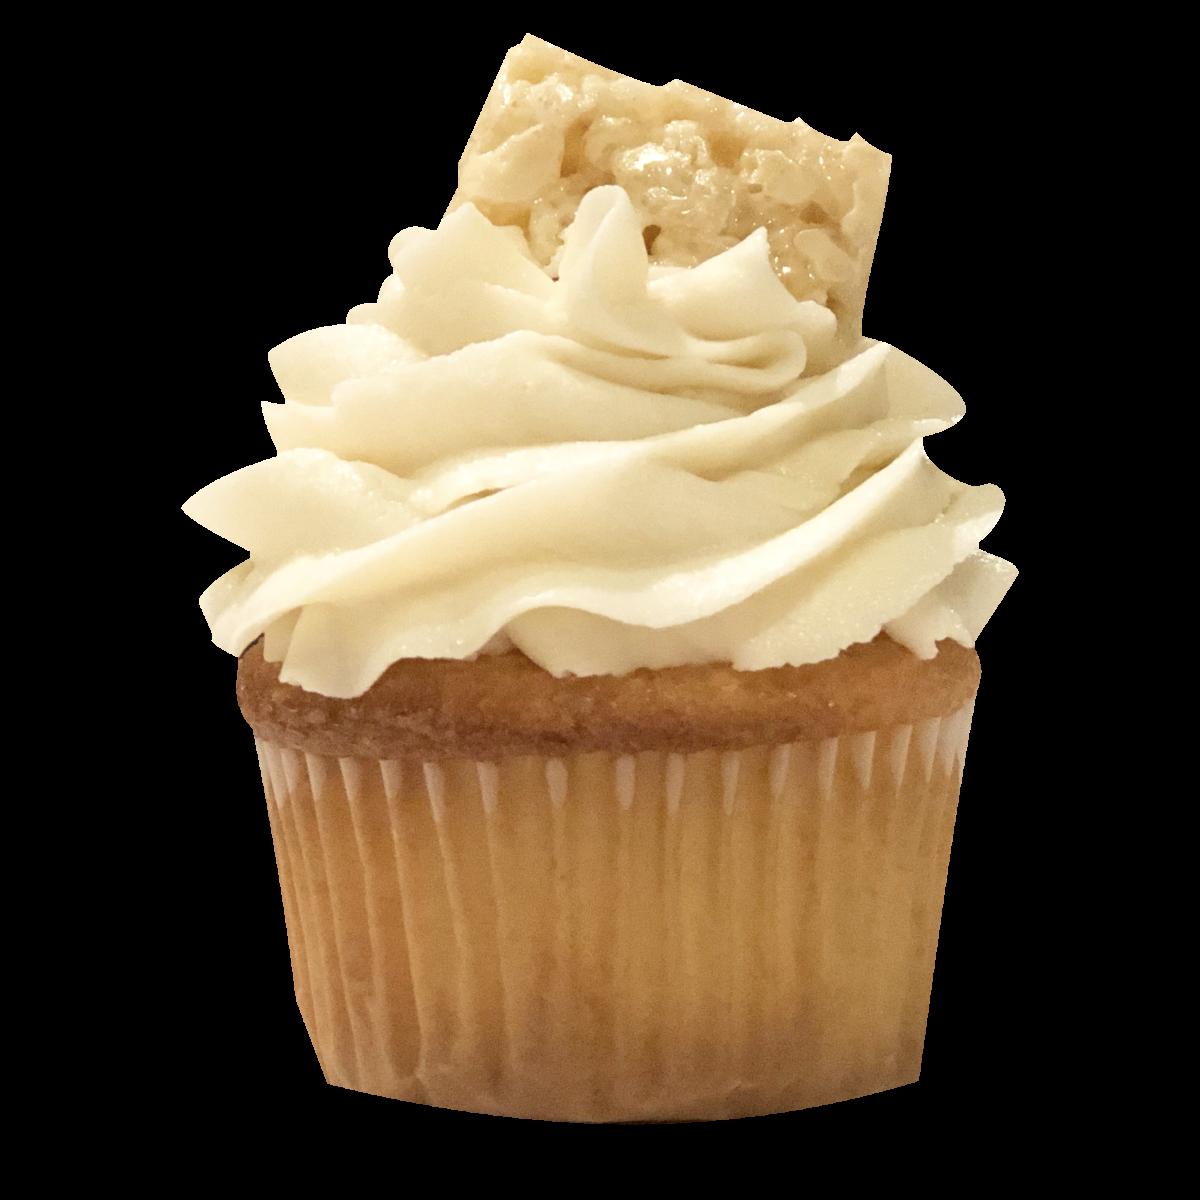 Rice Krispies Cupcake